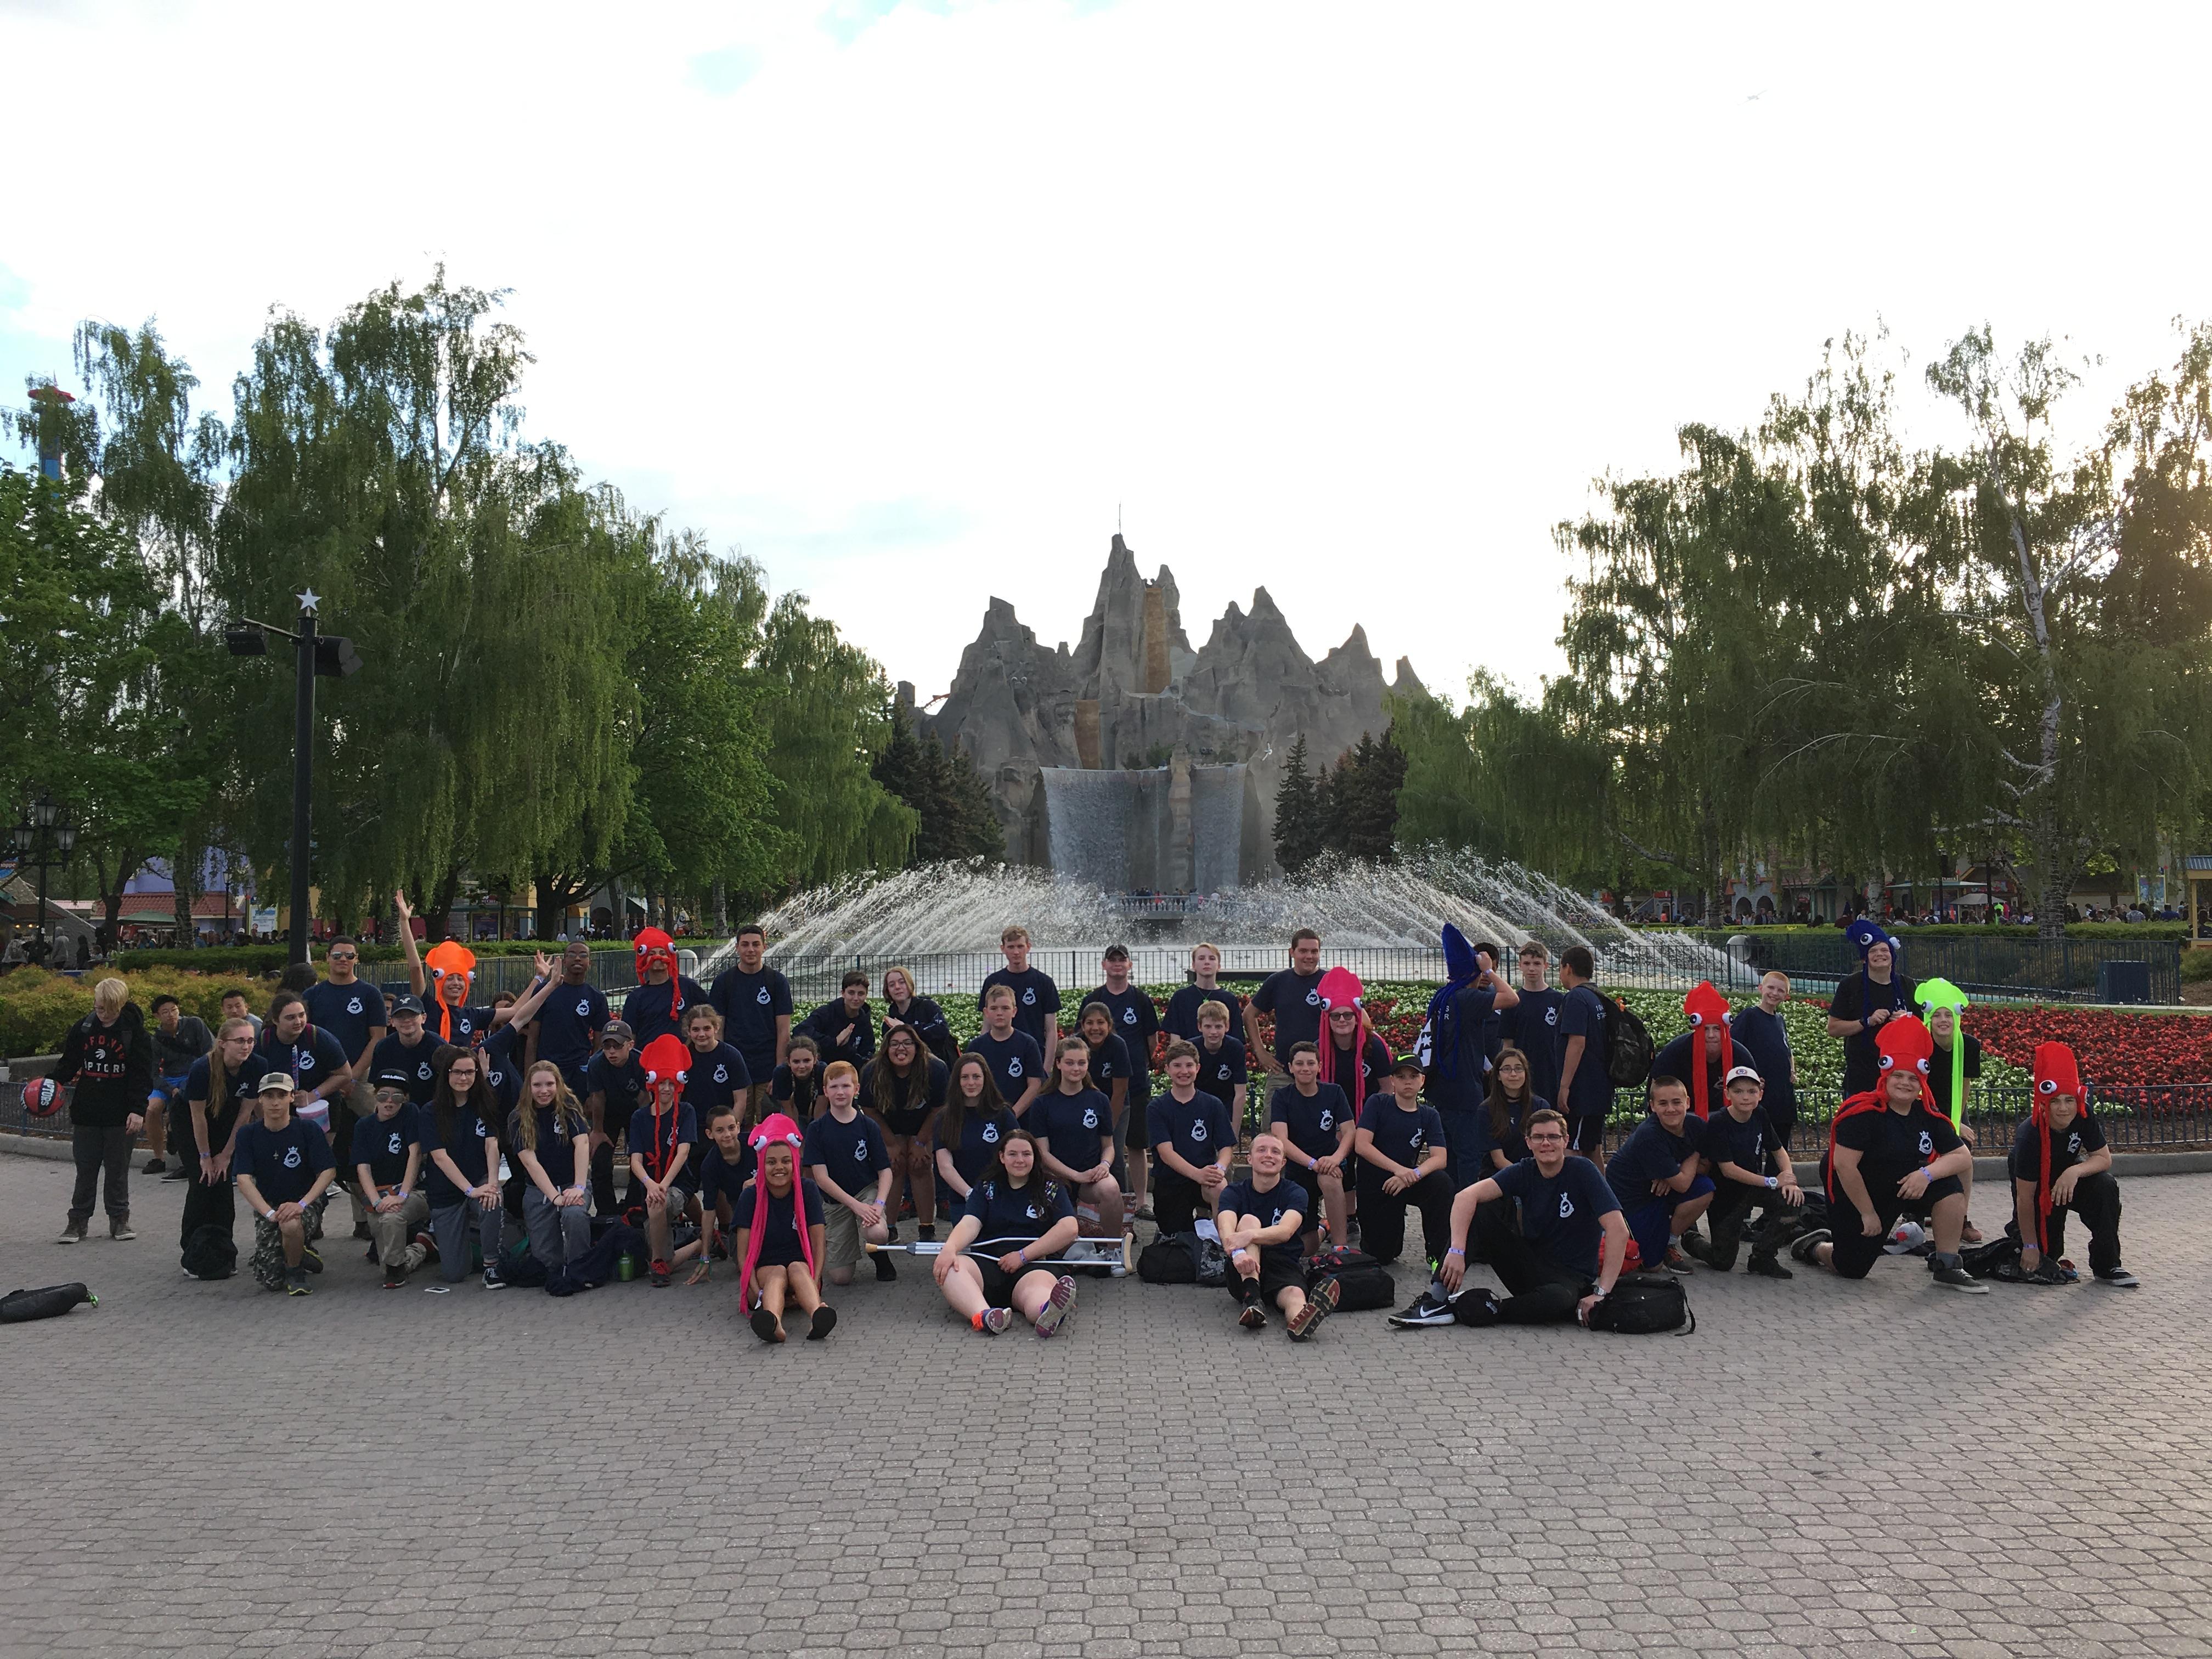 Canada's Wonderland 2017